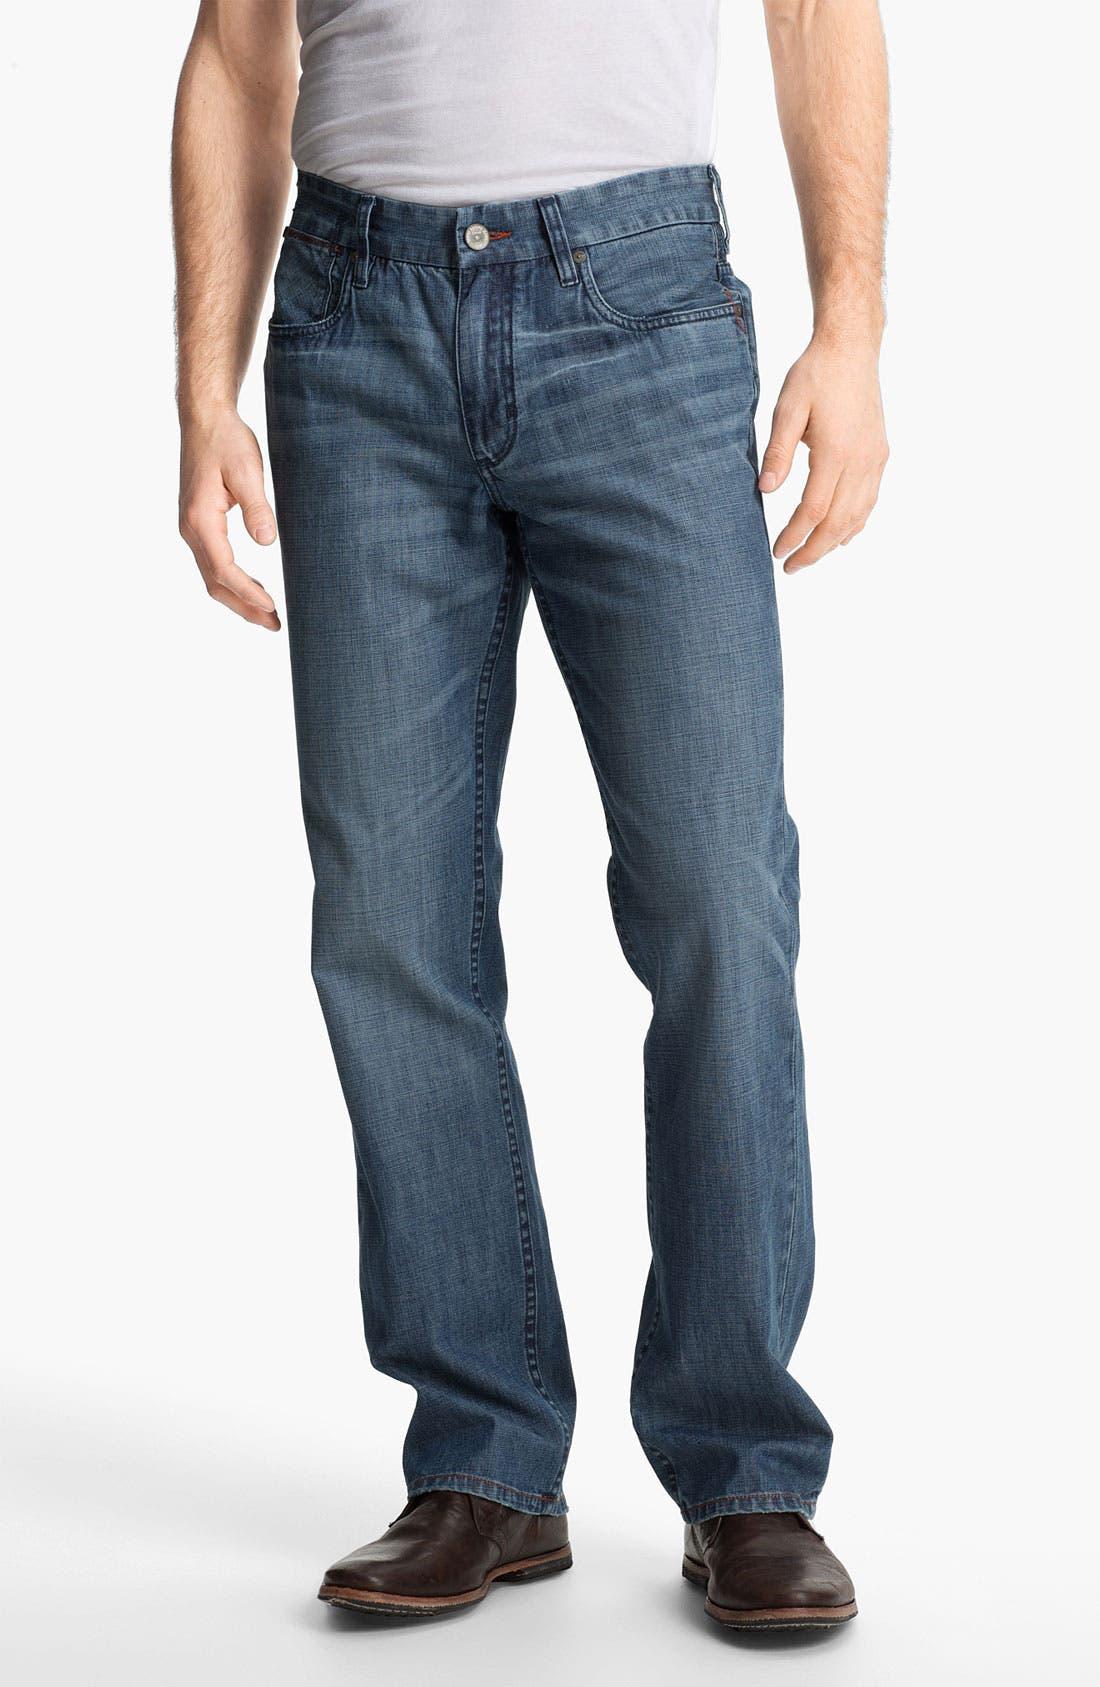 Main Image - Tommy Bahama Denim 'Cruz' Authentic Fit Jeans (Medium)